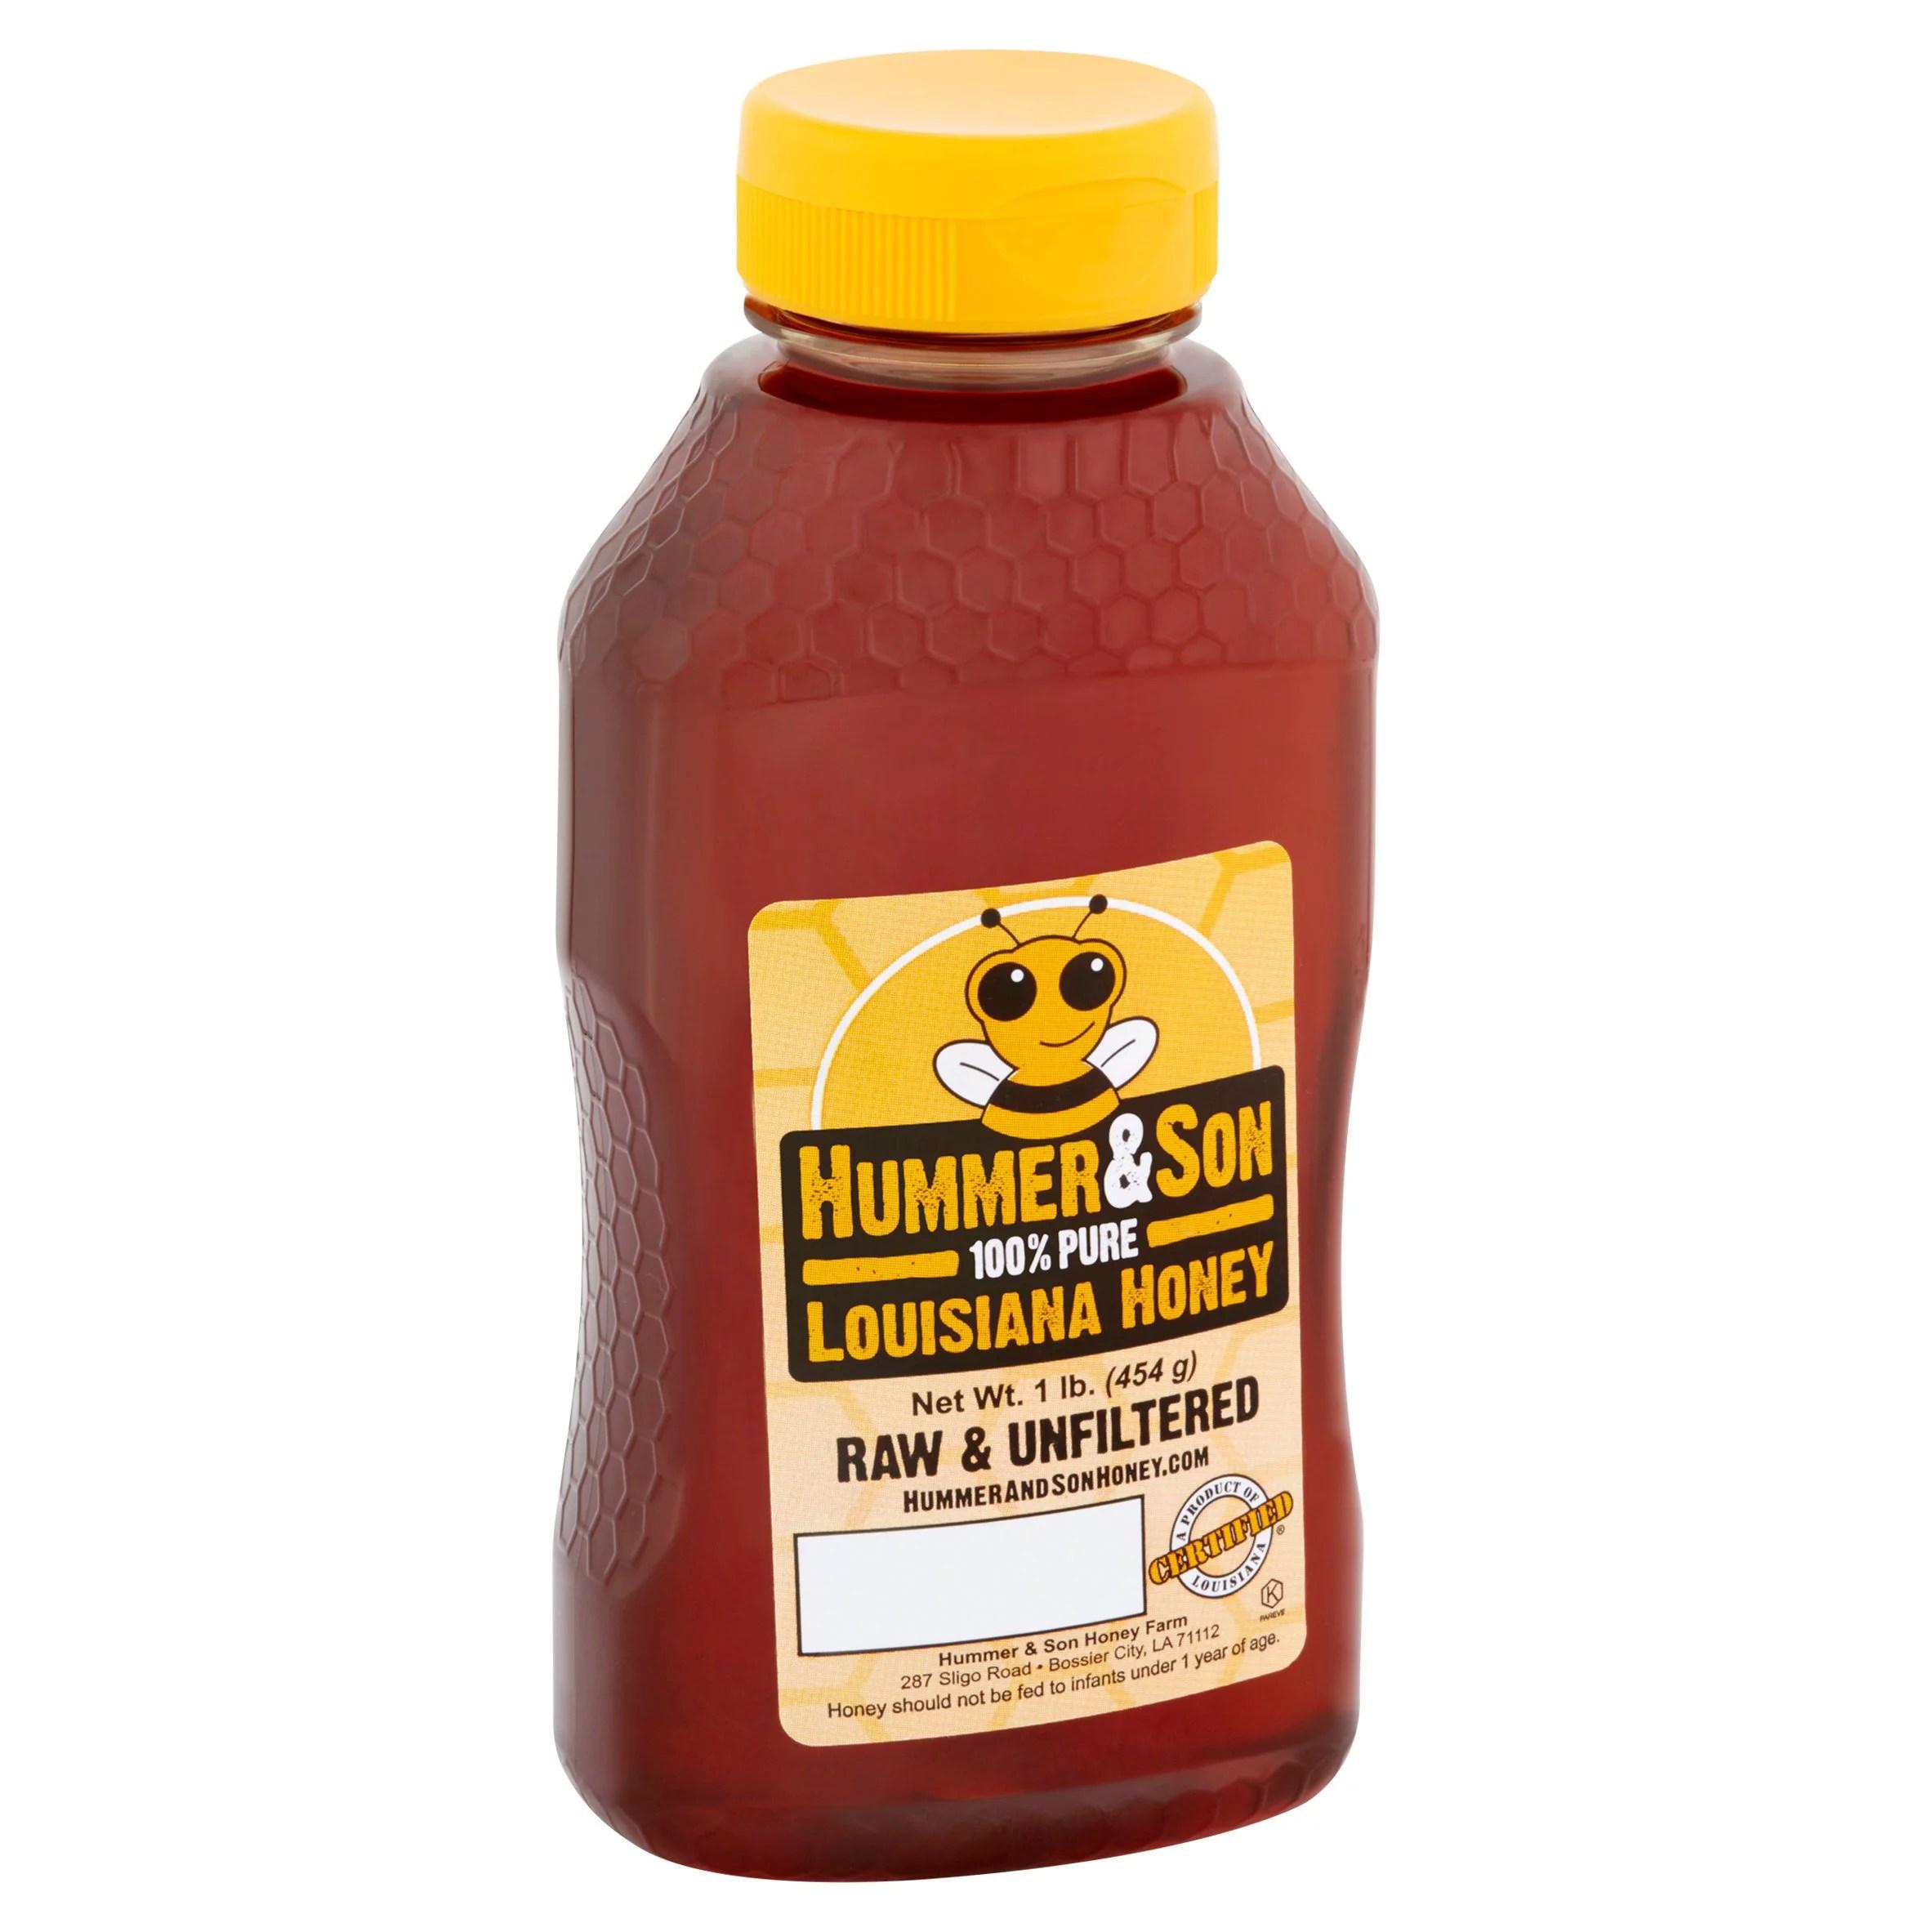 Hummer & Son Louisiana Honey 1 lb Walmart